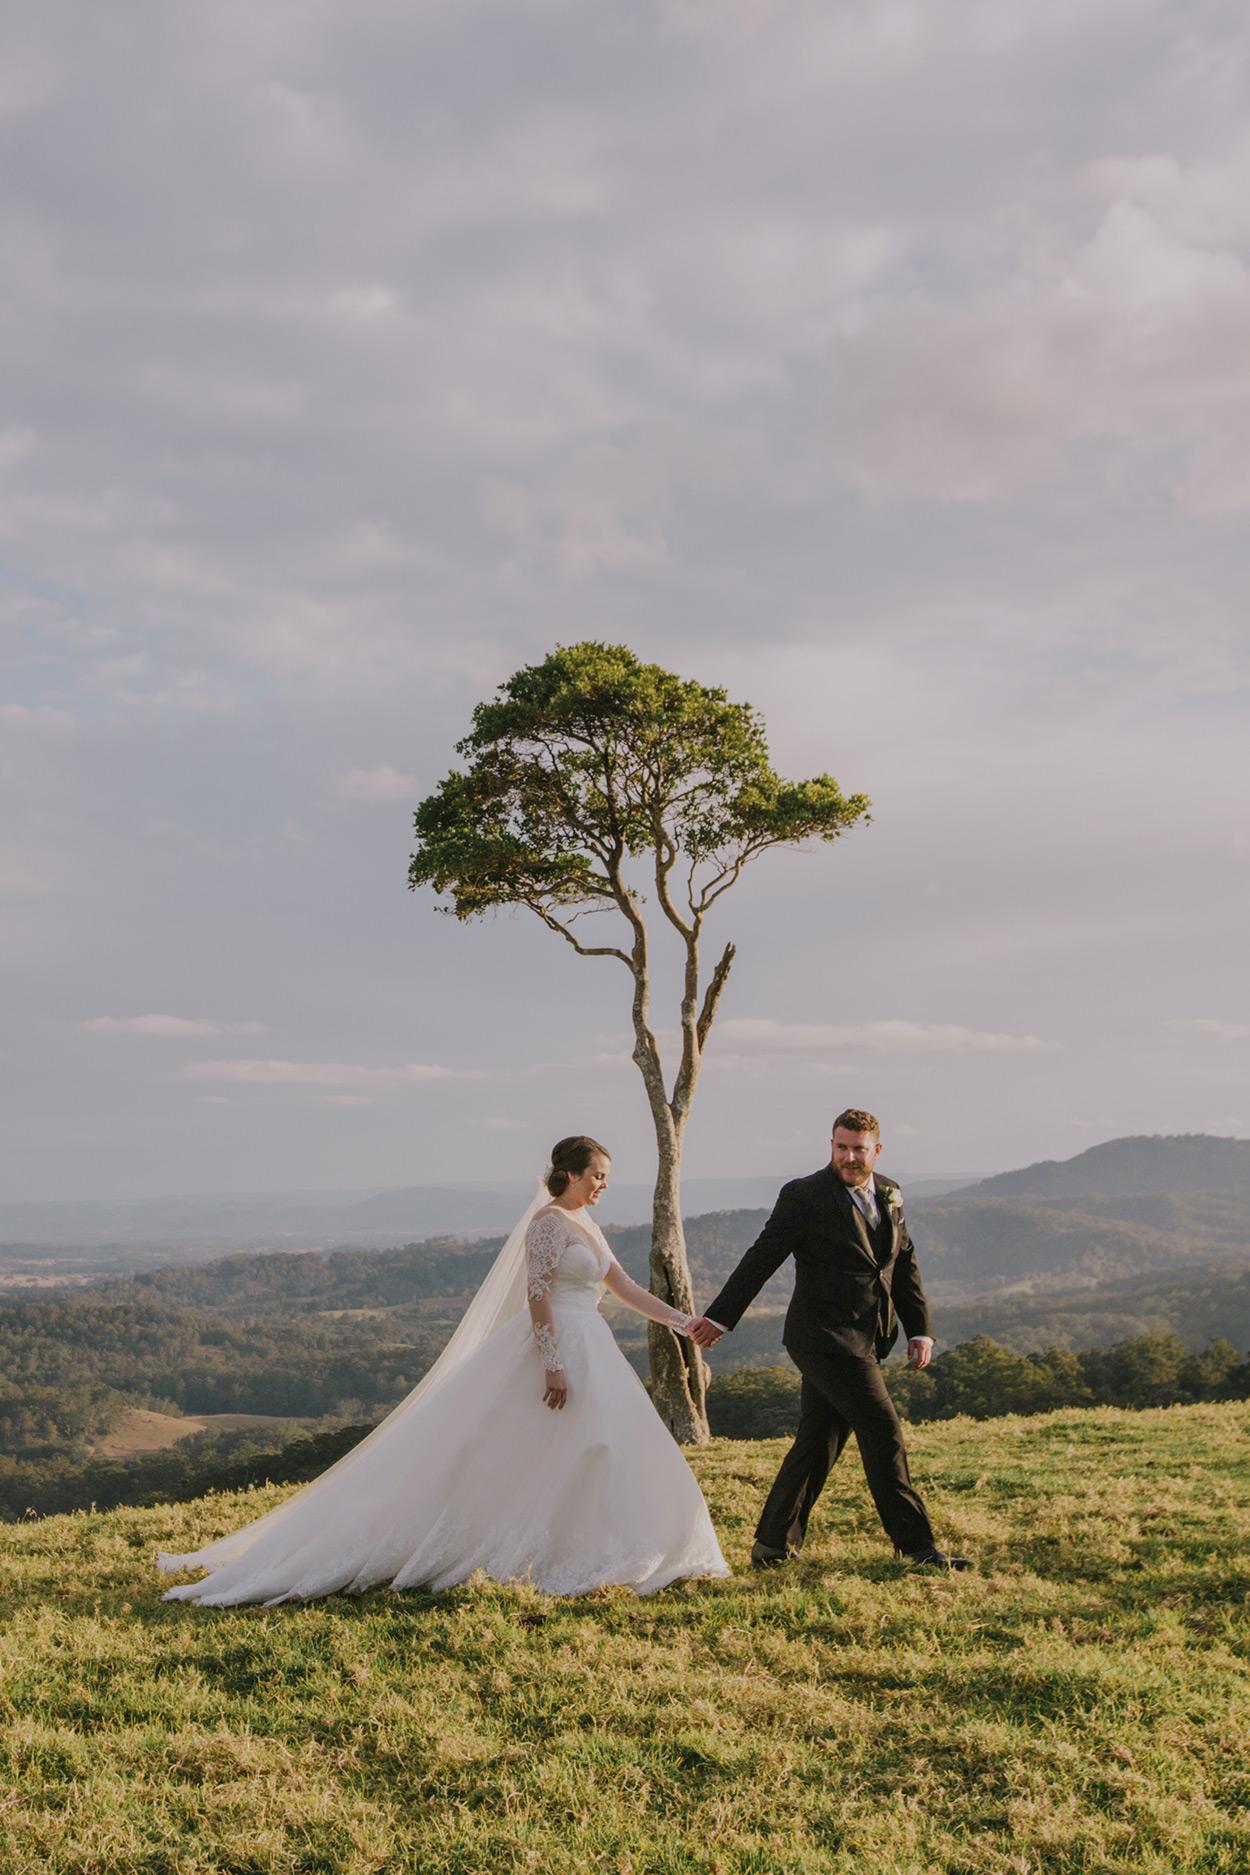 Maleny One Tree Hill Moments Wedding Photographer - Sunshine Coast, Queensland, Australian Destination Elopement